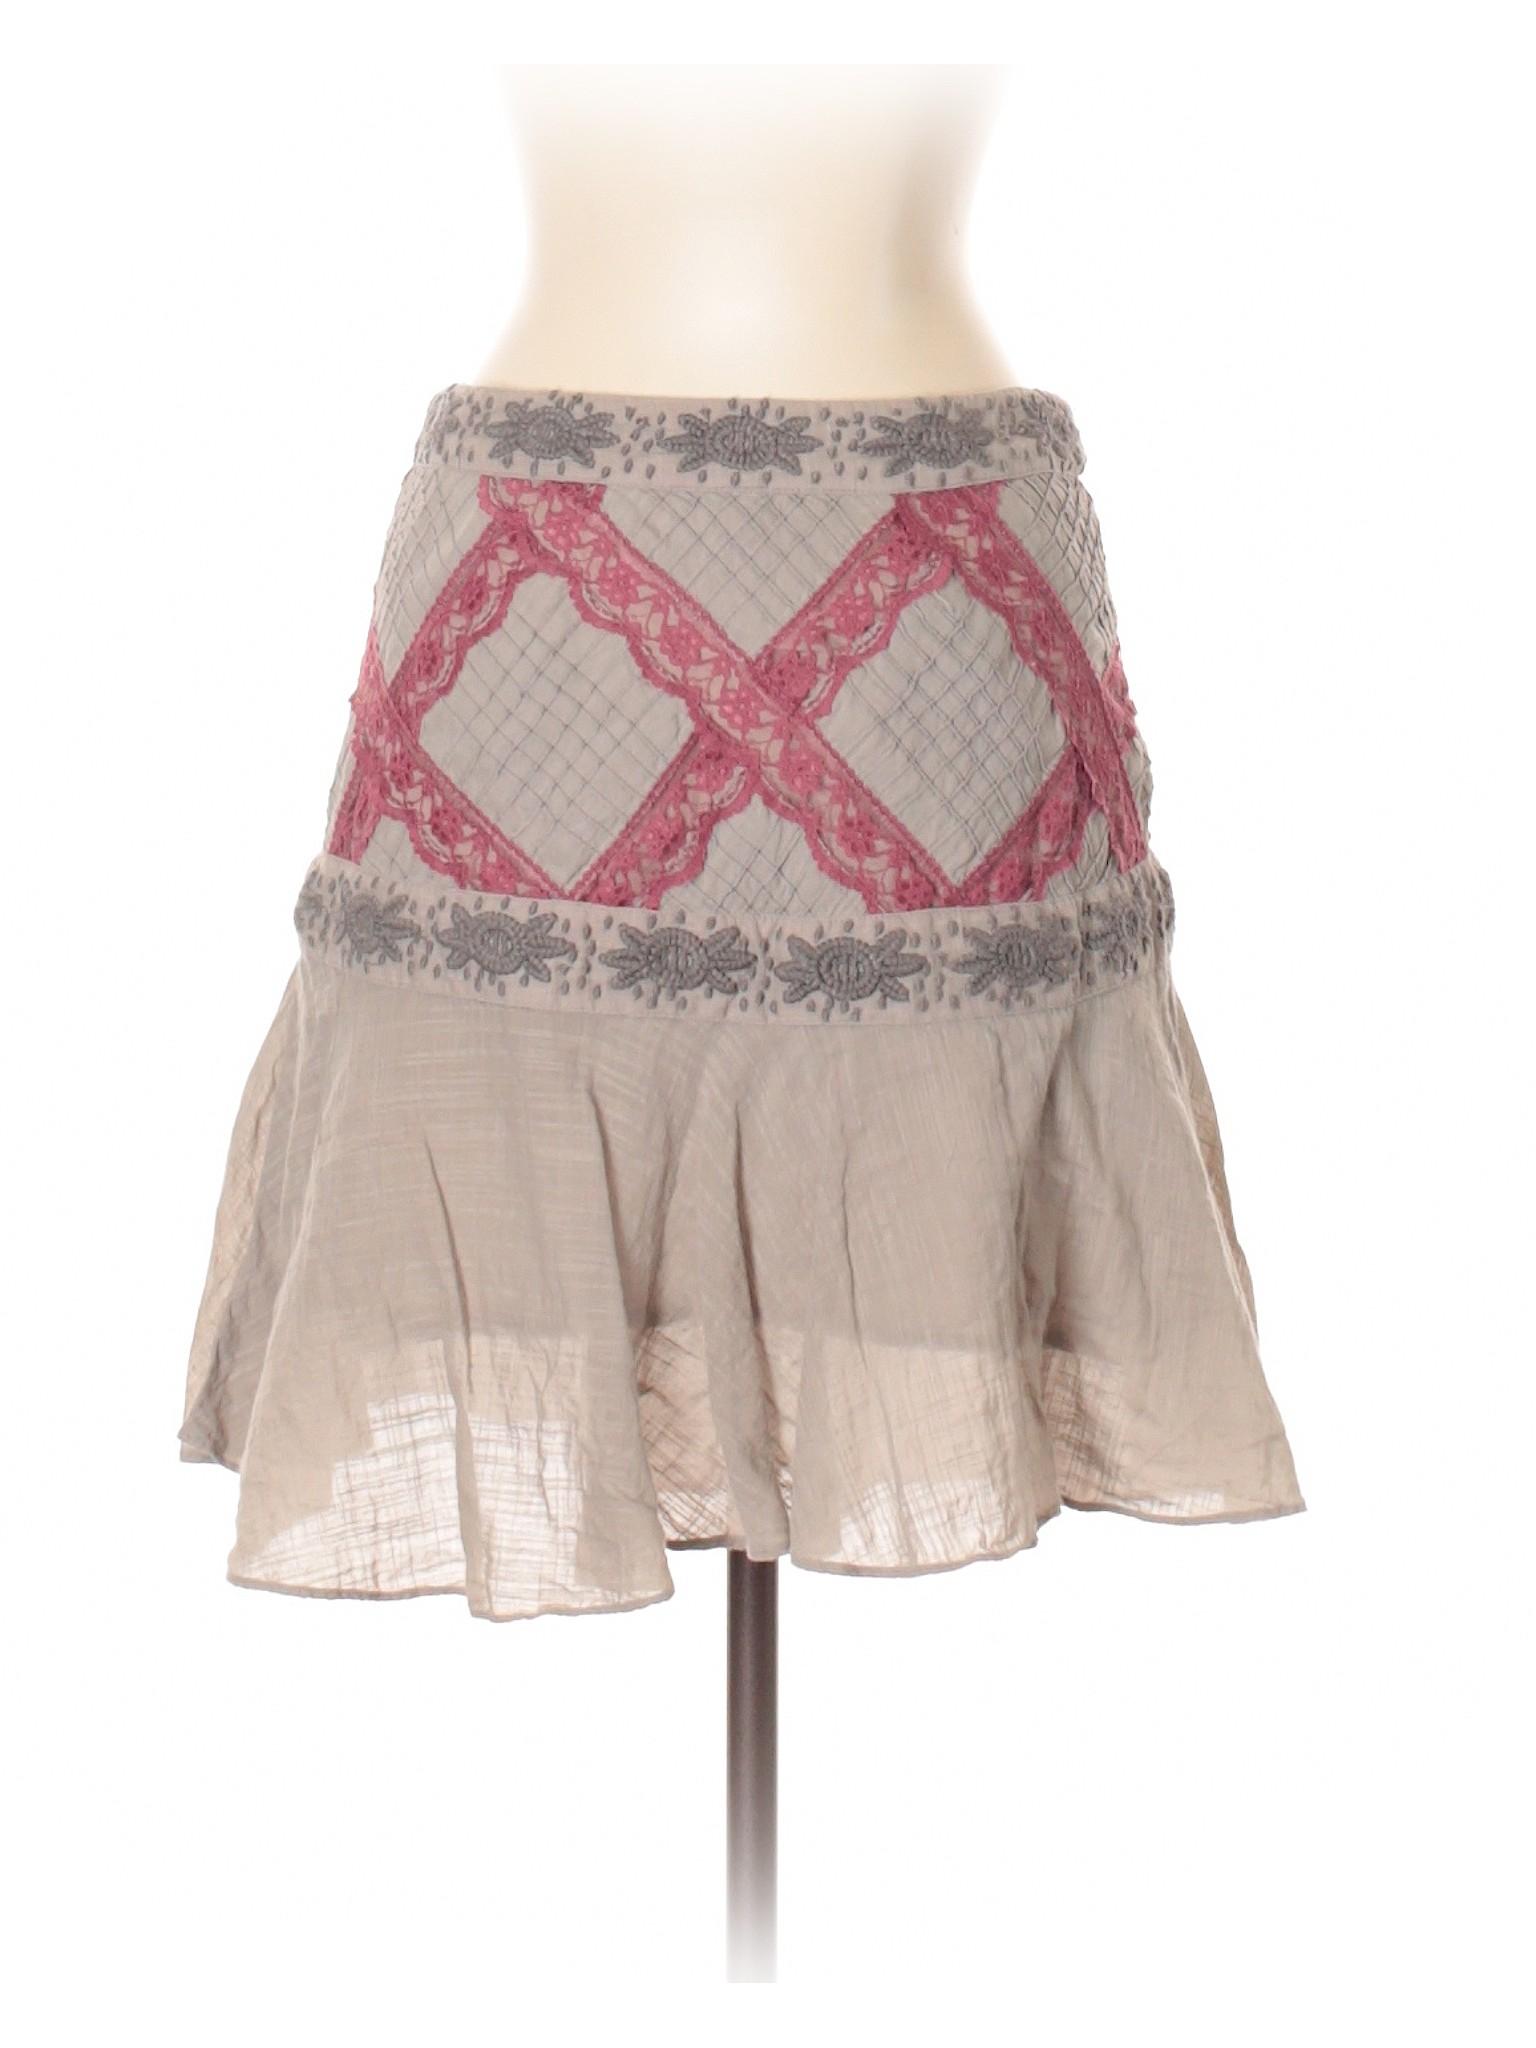 Free Leisure People winter Casual Skirt FZZ0O